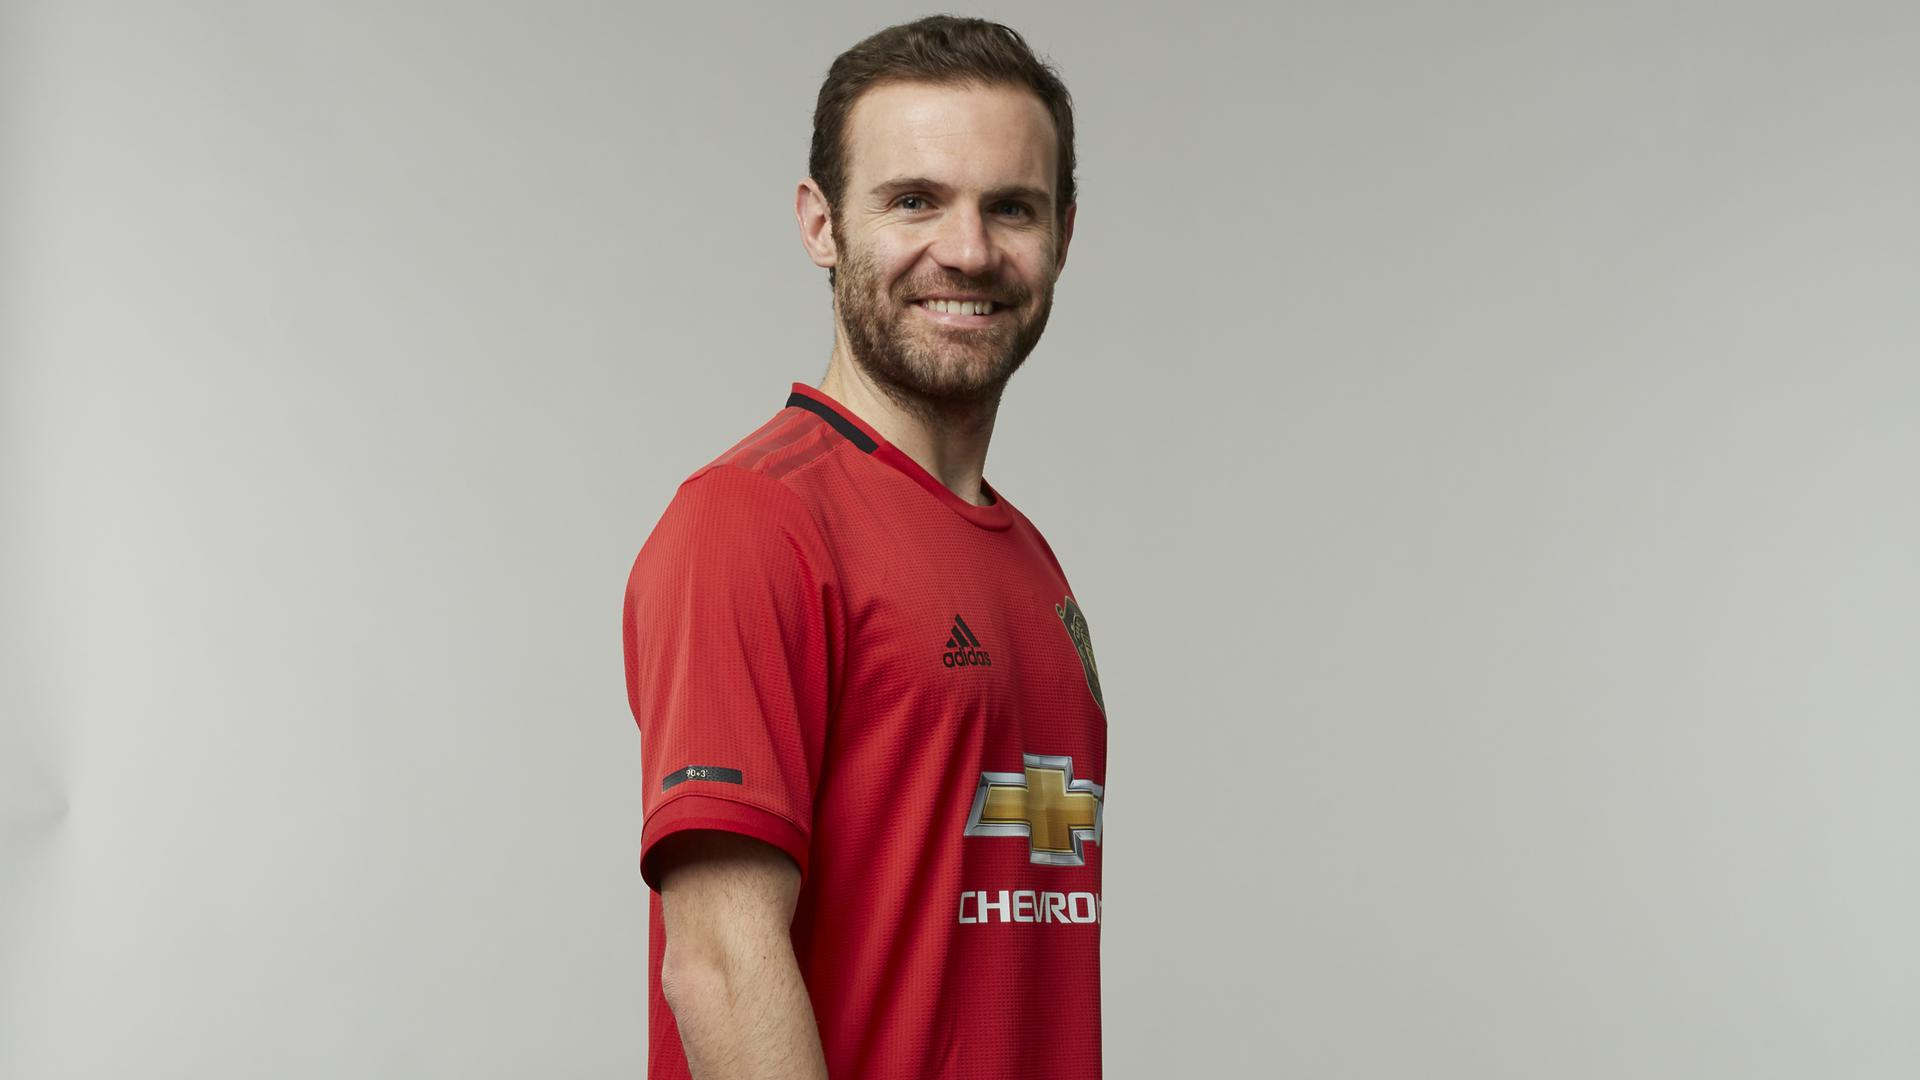 لیگ برتر-انگلیس-اسپانیا-منچستریونایتد-Spain-Premier League-England-Manchester United